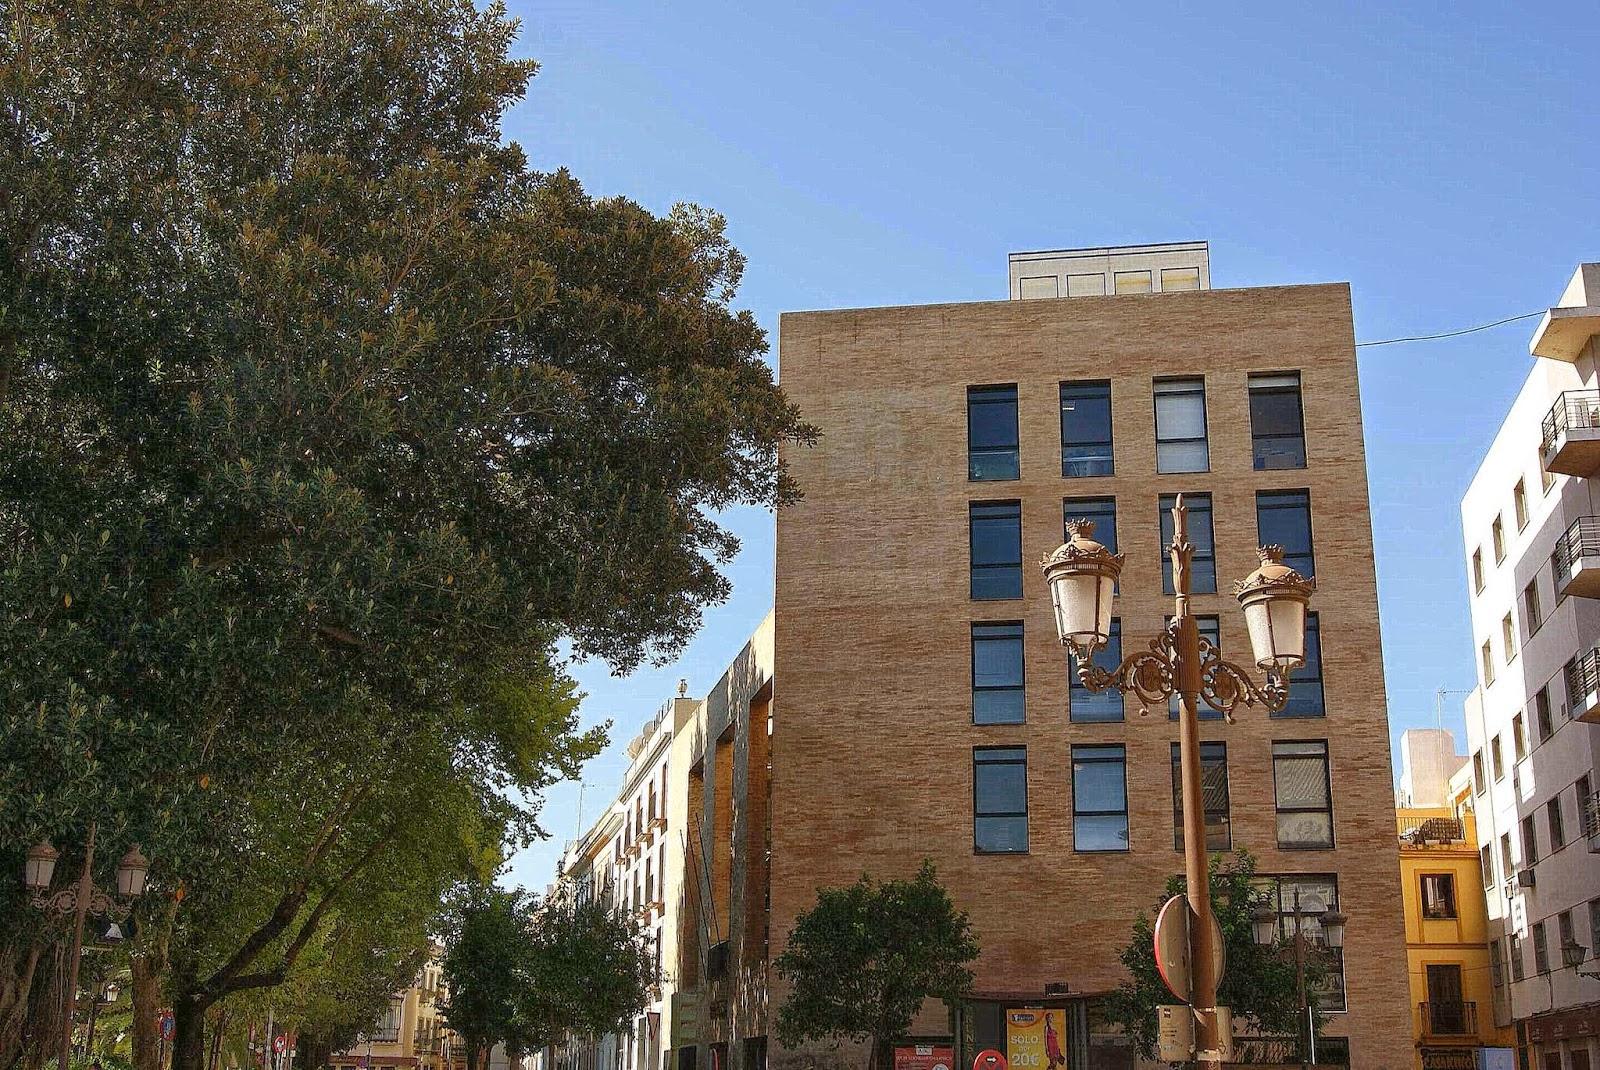 Leyendas de sevilla iglesia de san pedro ap stol i - Colegio de arquitectos sevilla ...